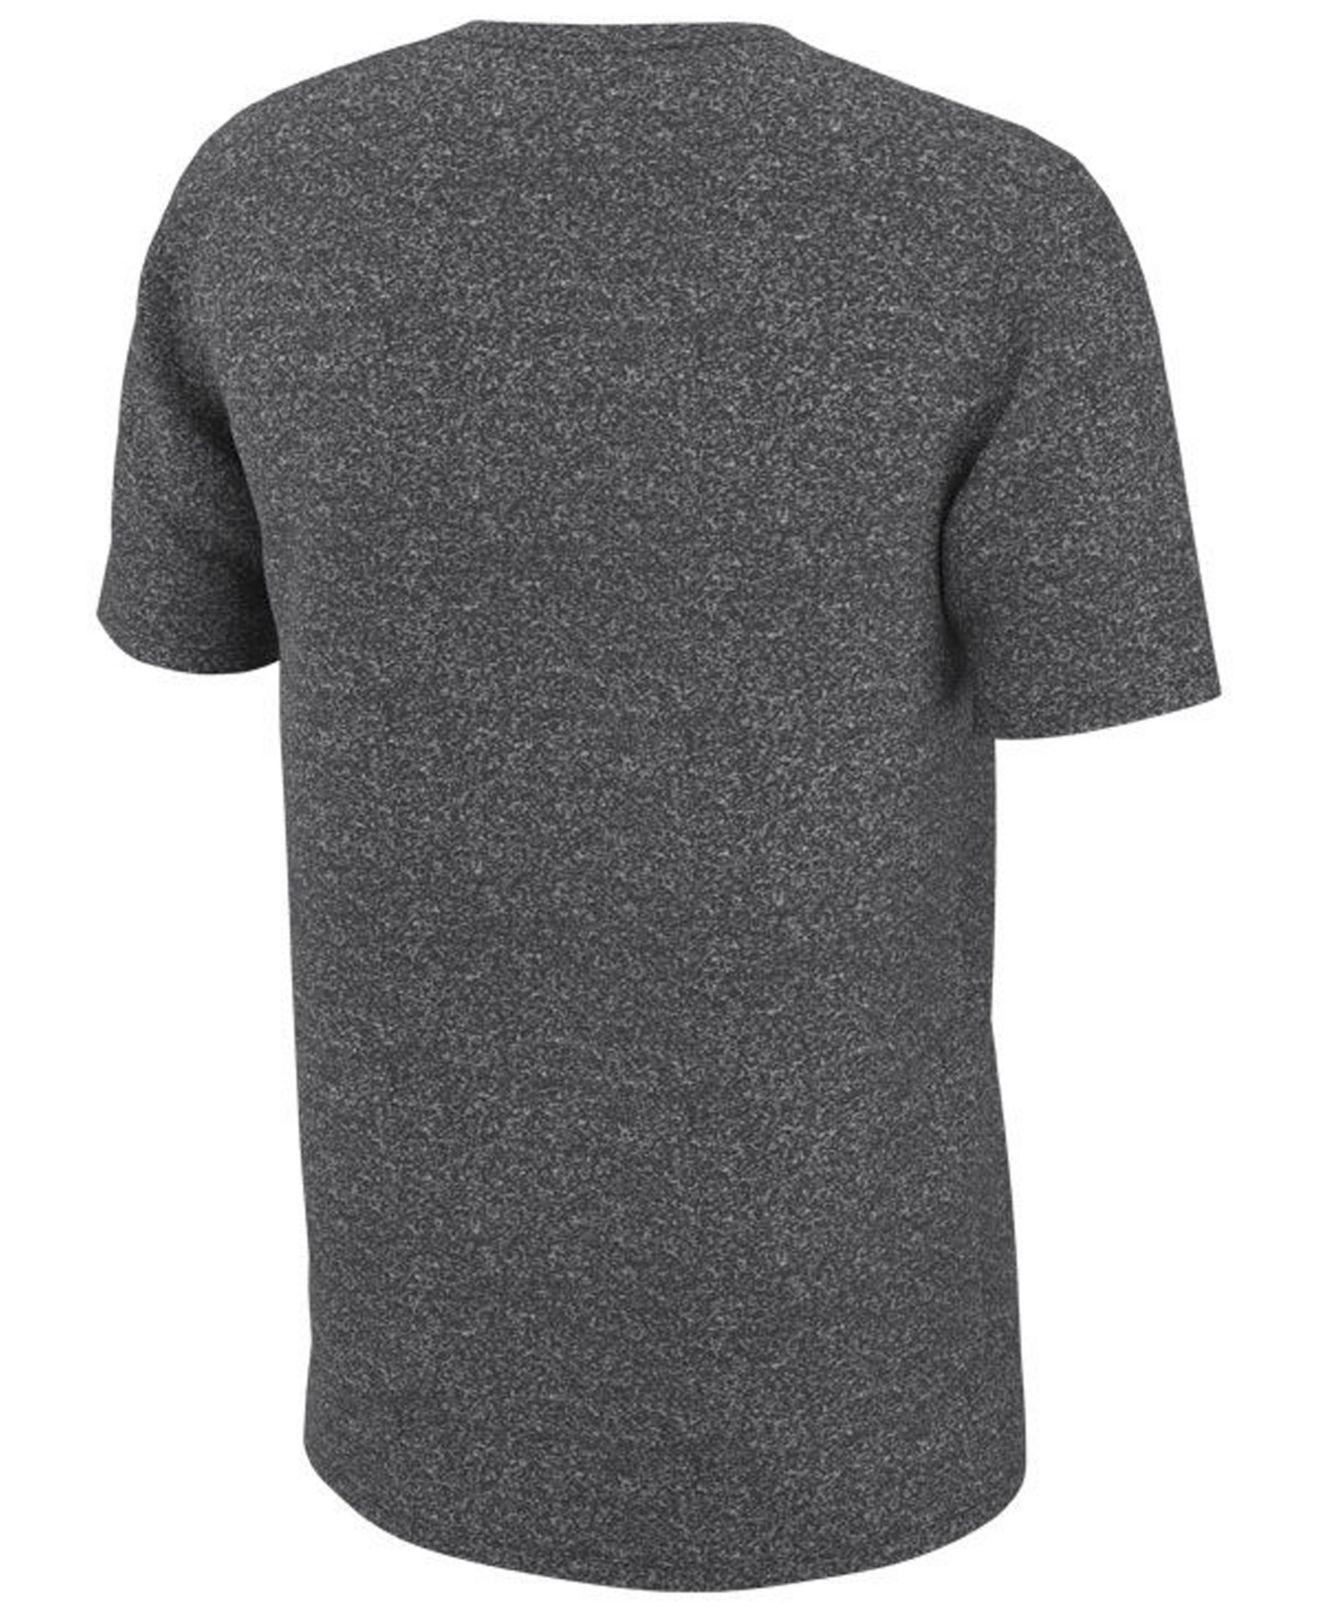 Lyst - Nike Minnesota Vikings Marled Gym Arch T-shirt in Gray for Men b63748d20